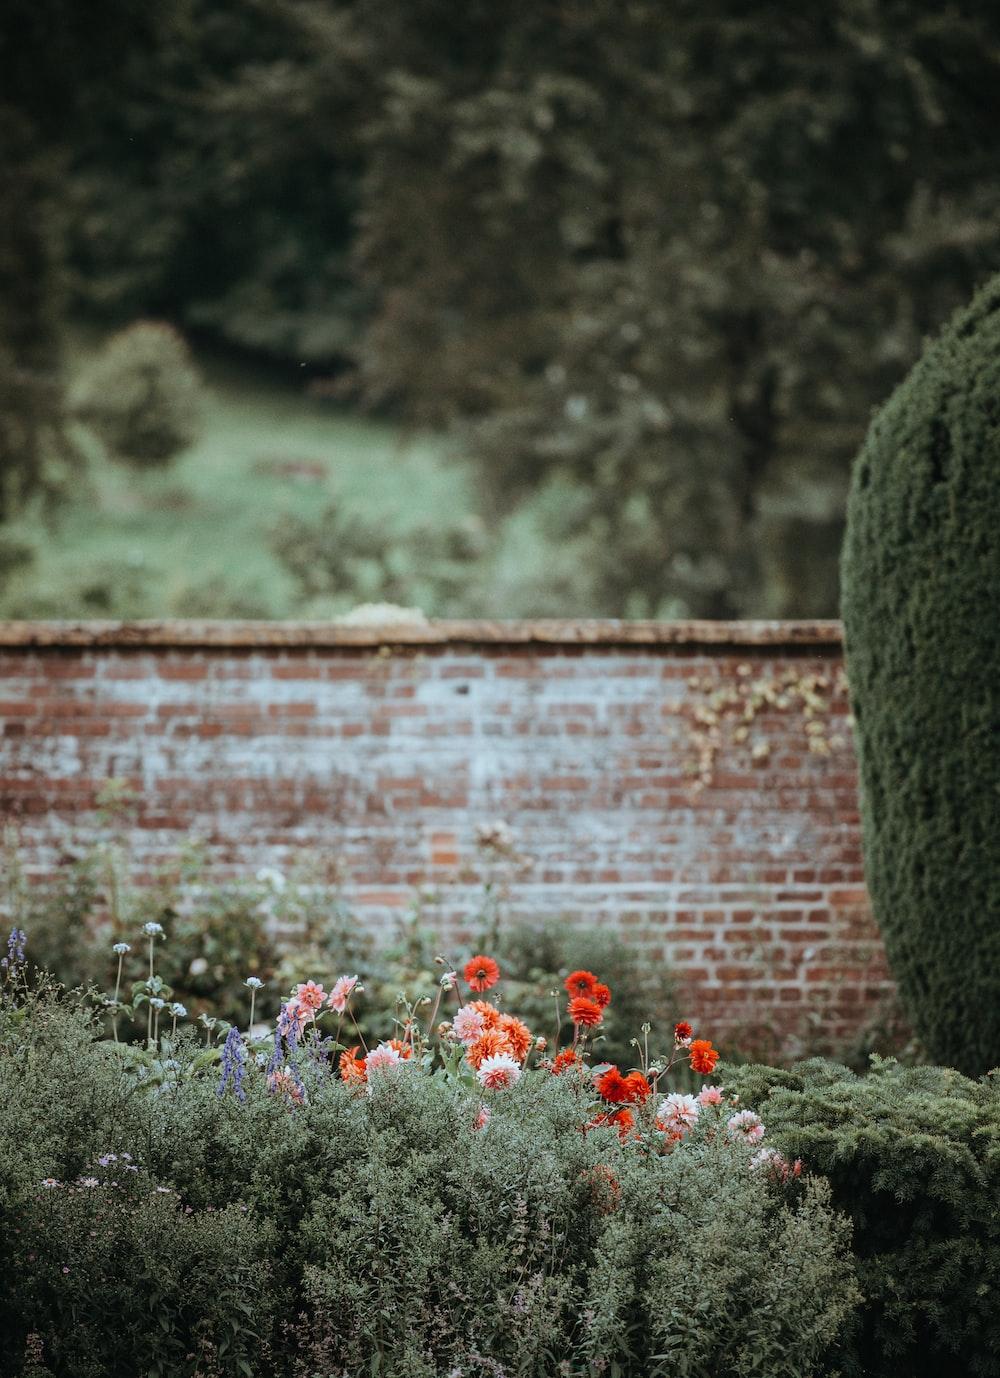 flowers near brown concrete wall